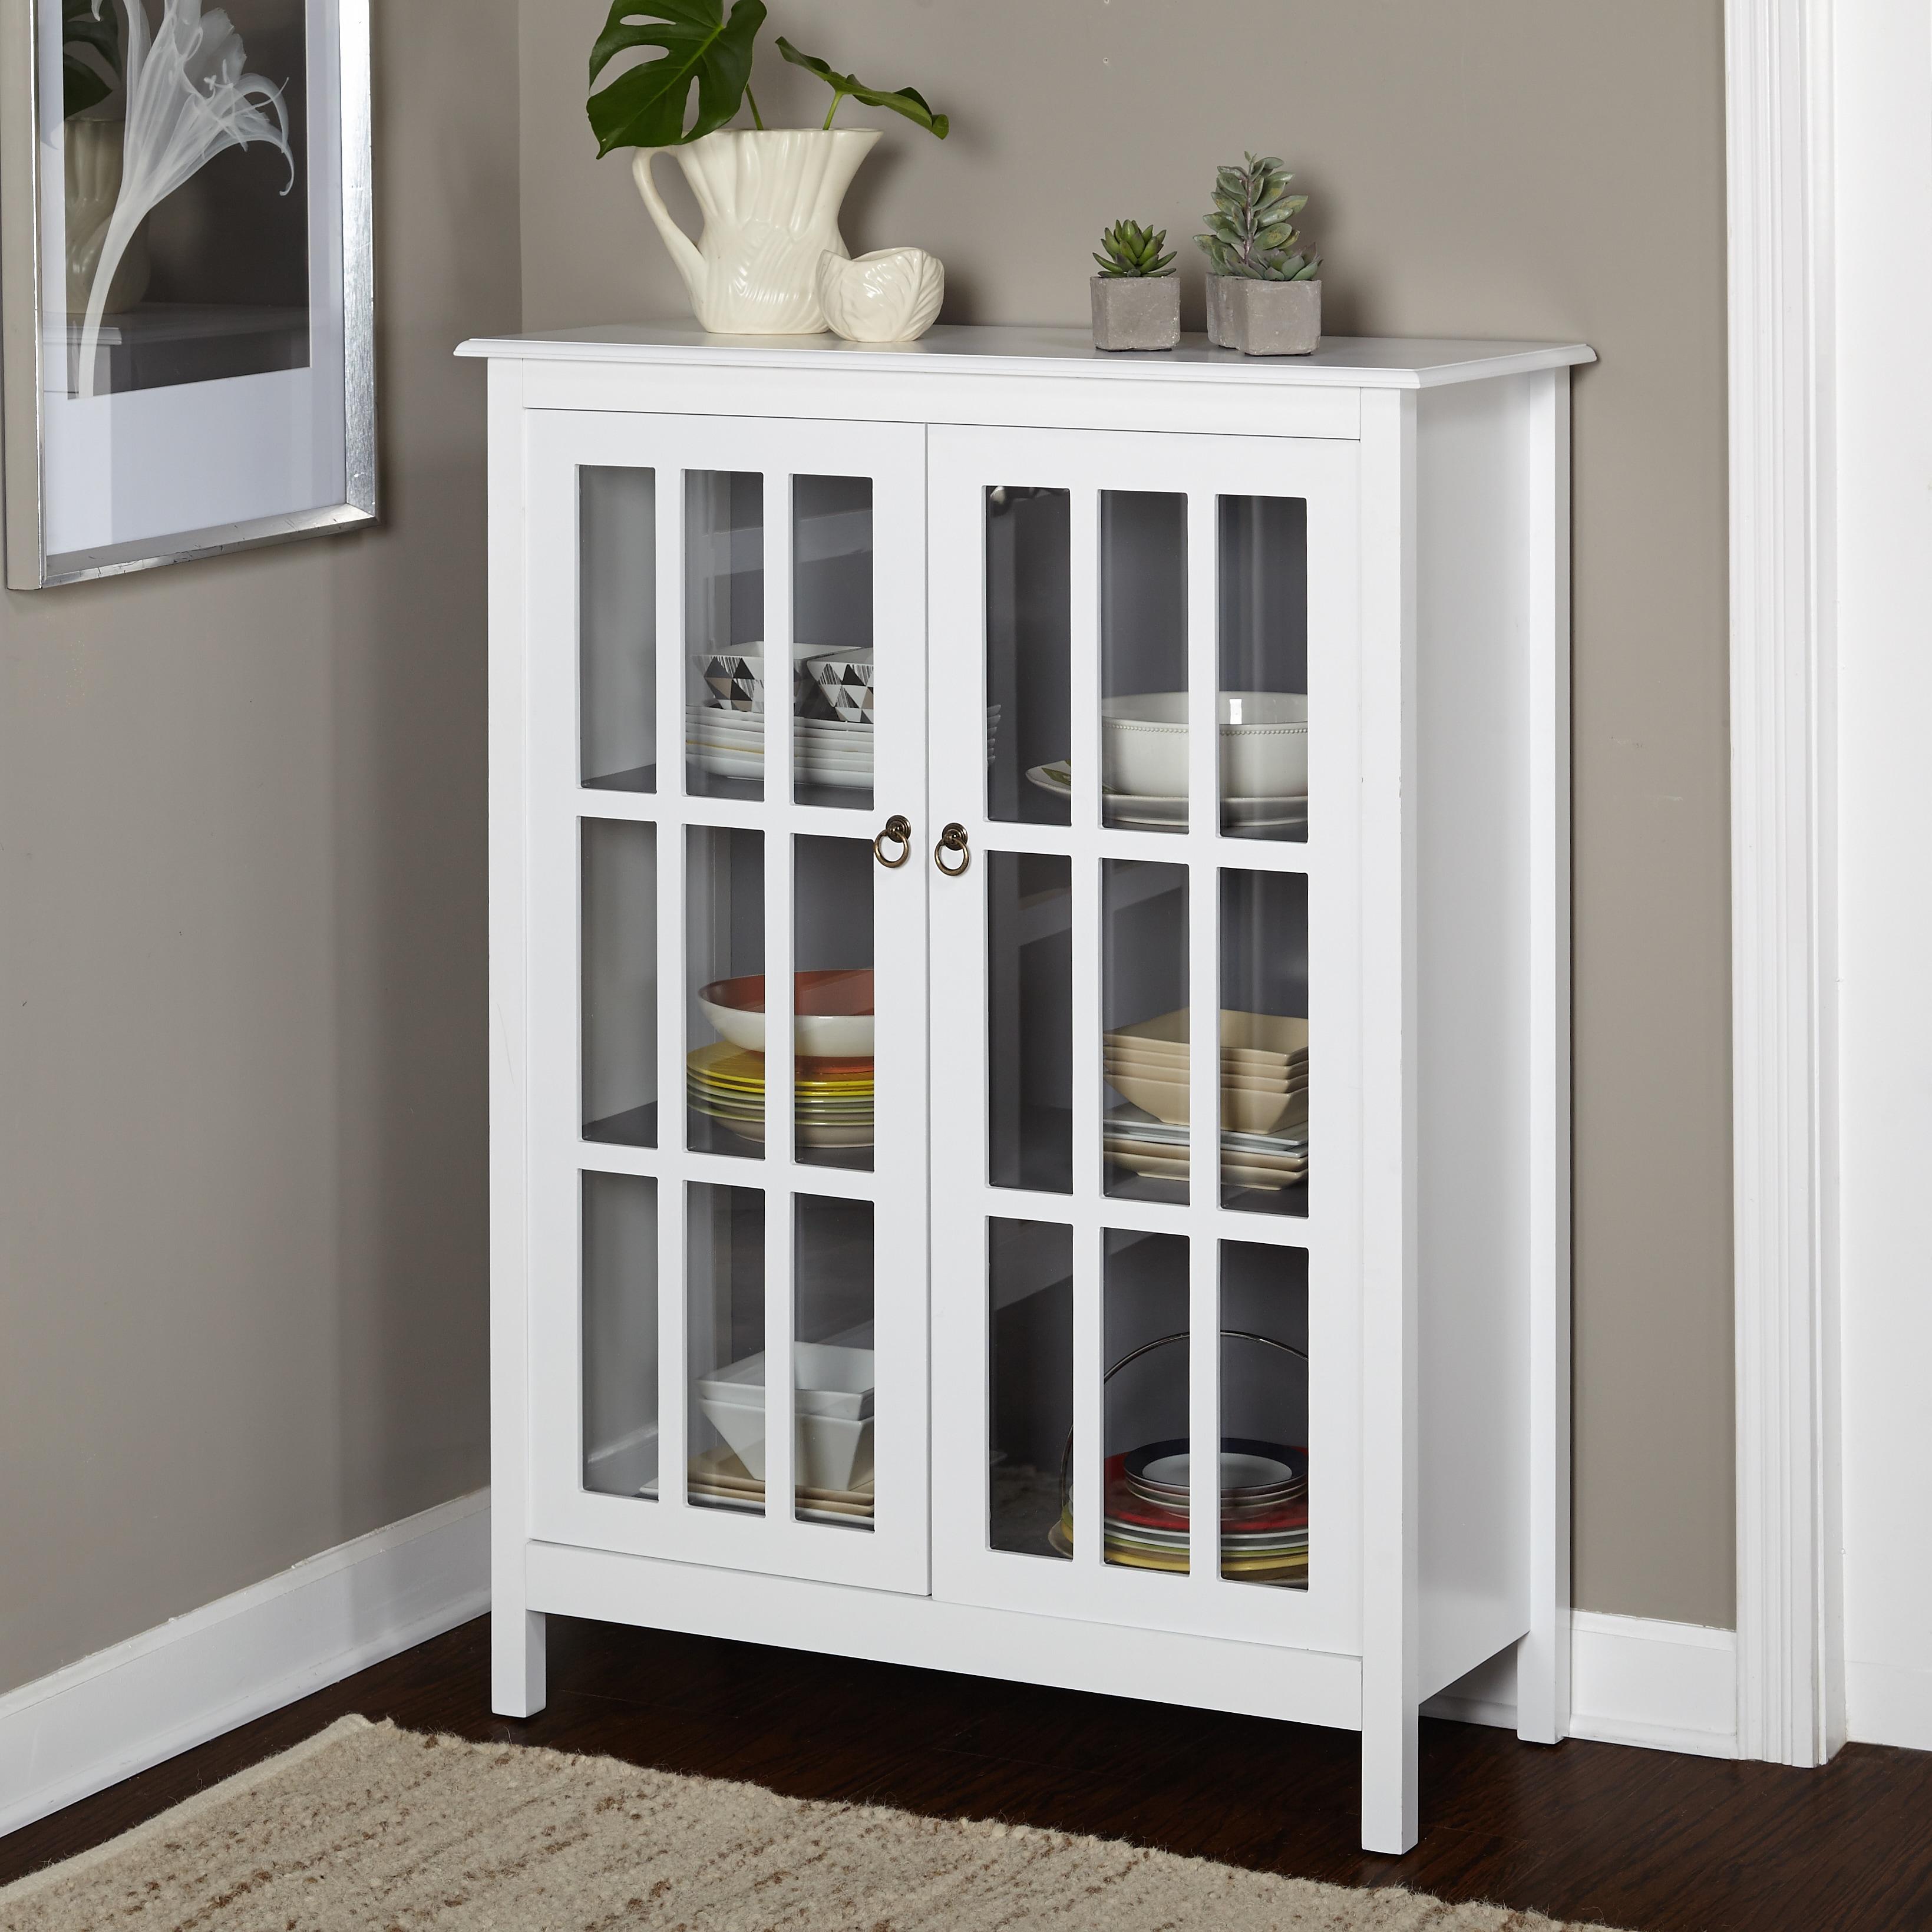 Simple Living Portland Window Pane Cabinet (Portland Tall...